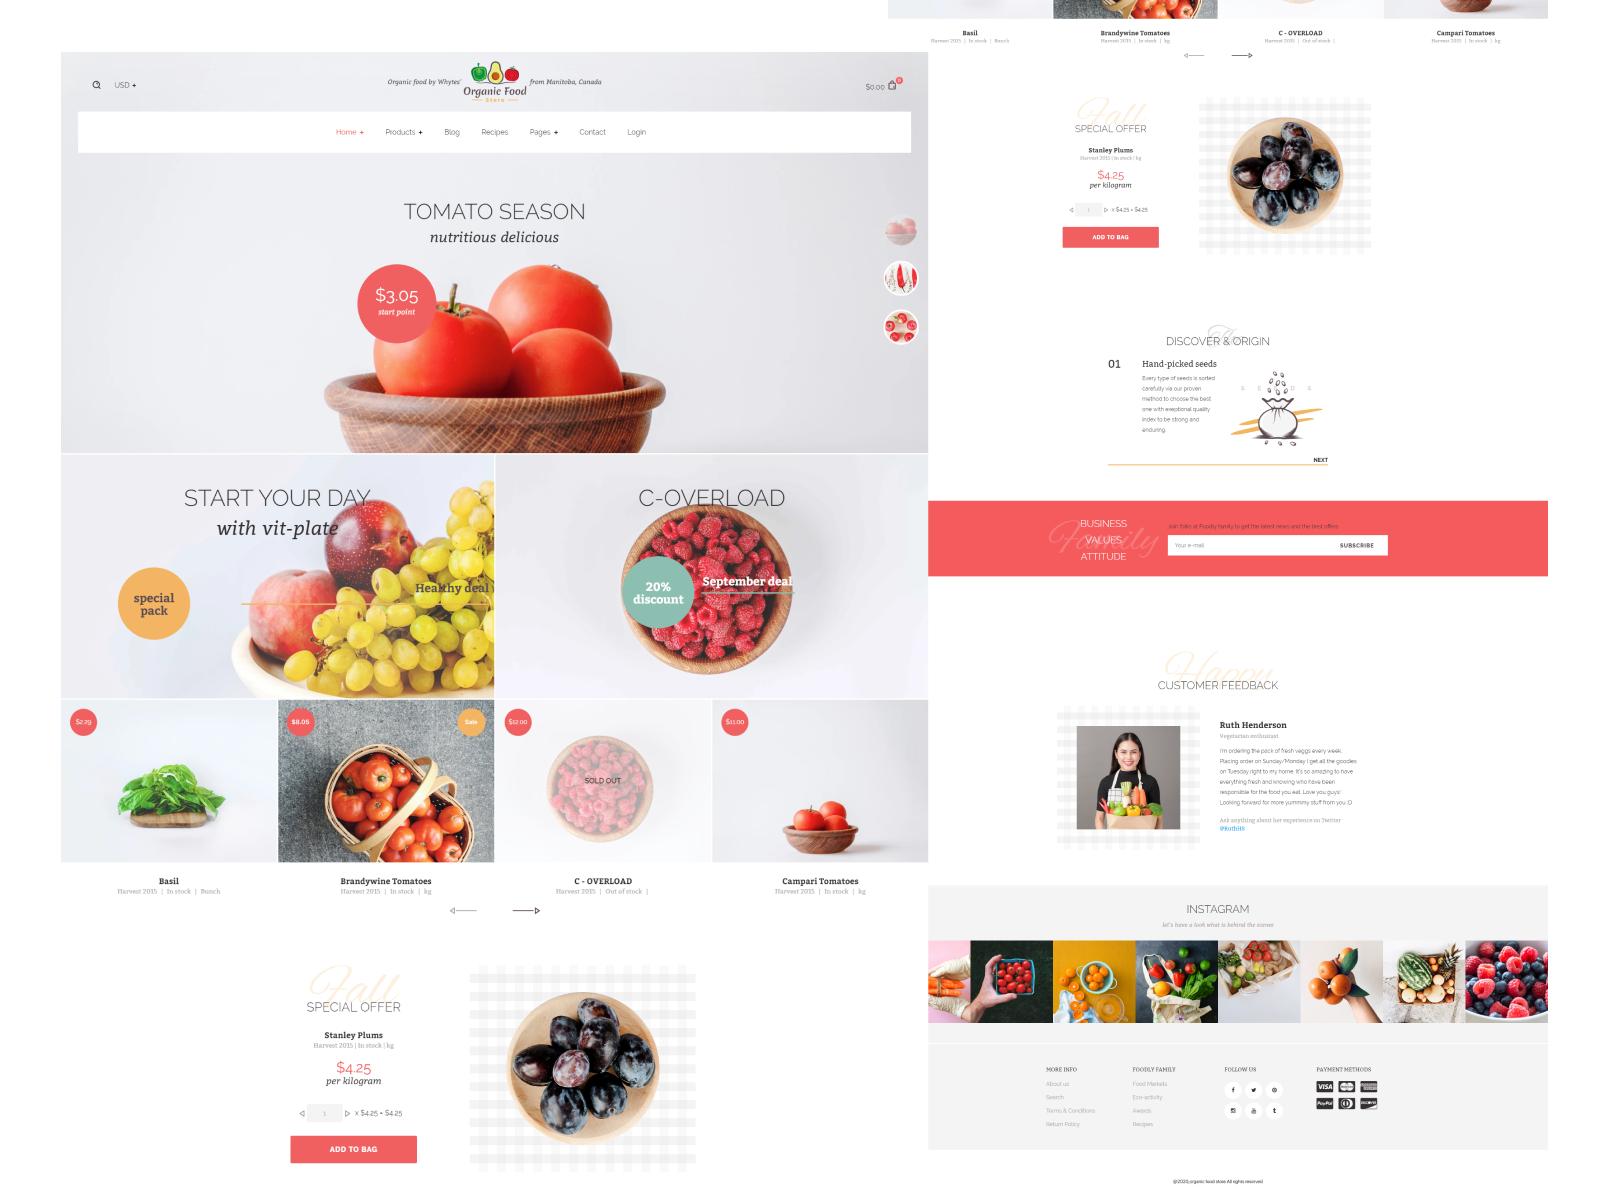 Organic Food Store By Techcronus Business Solutions Pvt Ltd On Dribbble